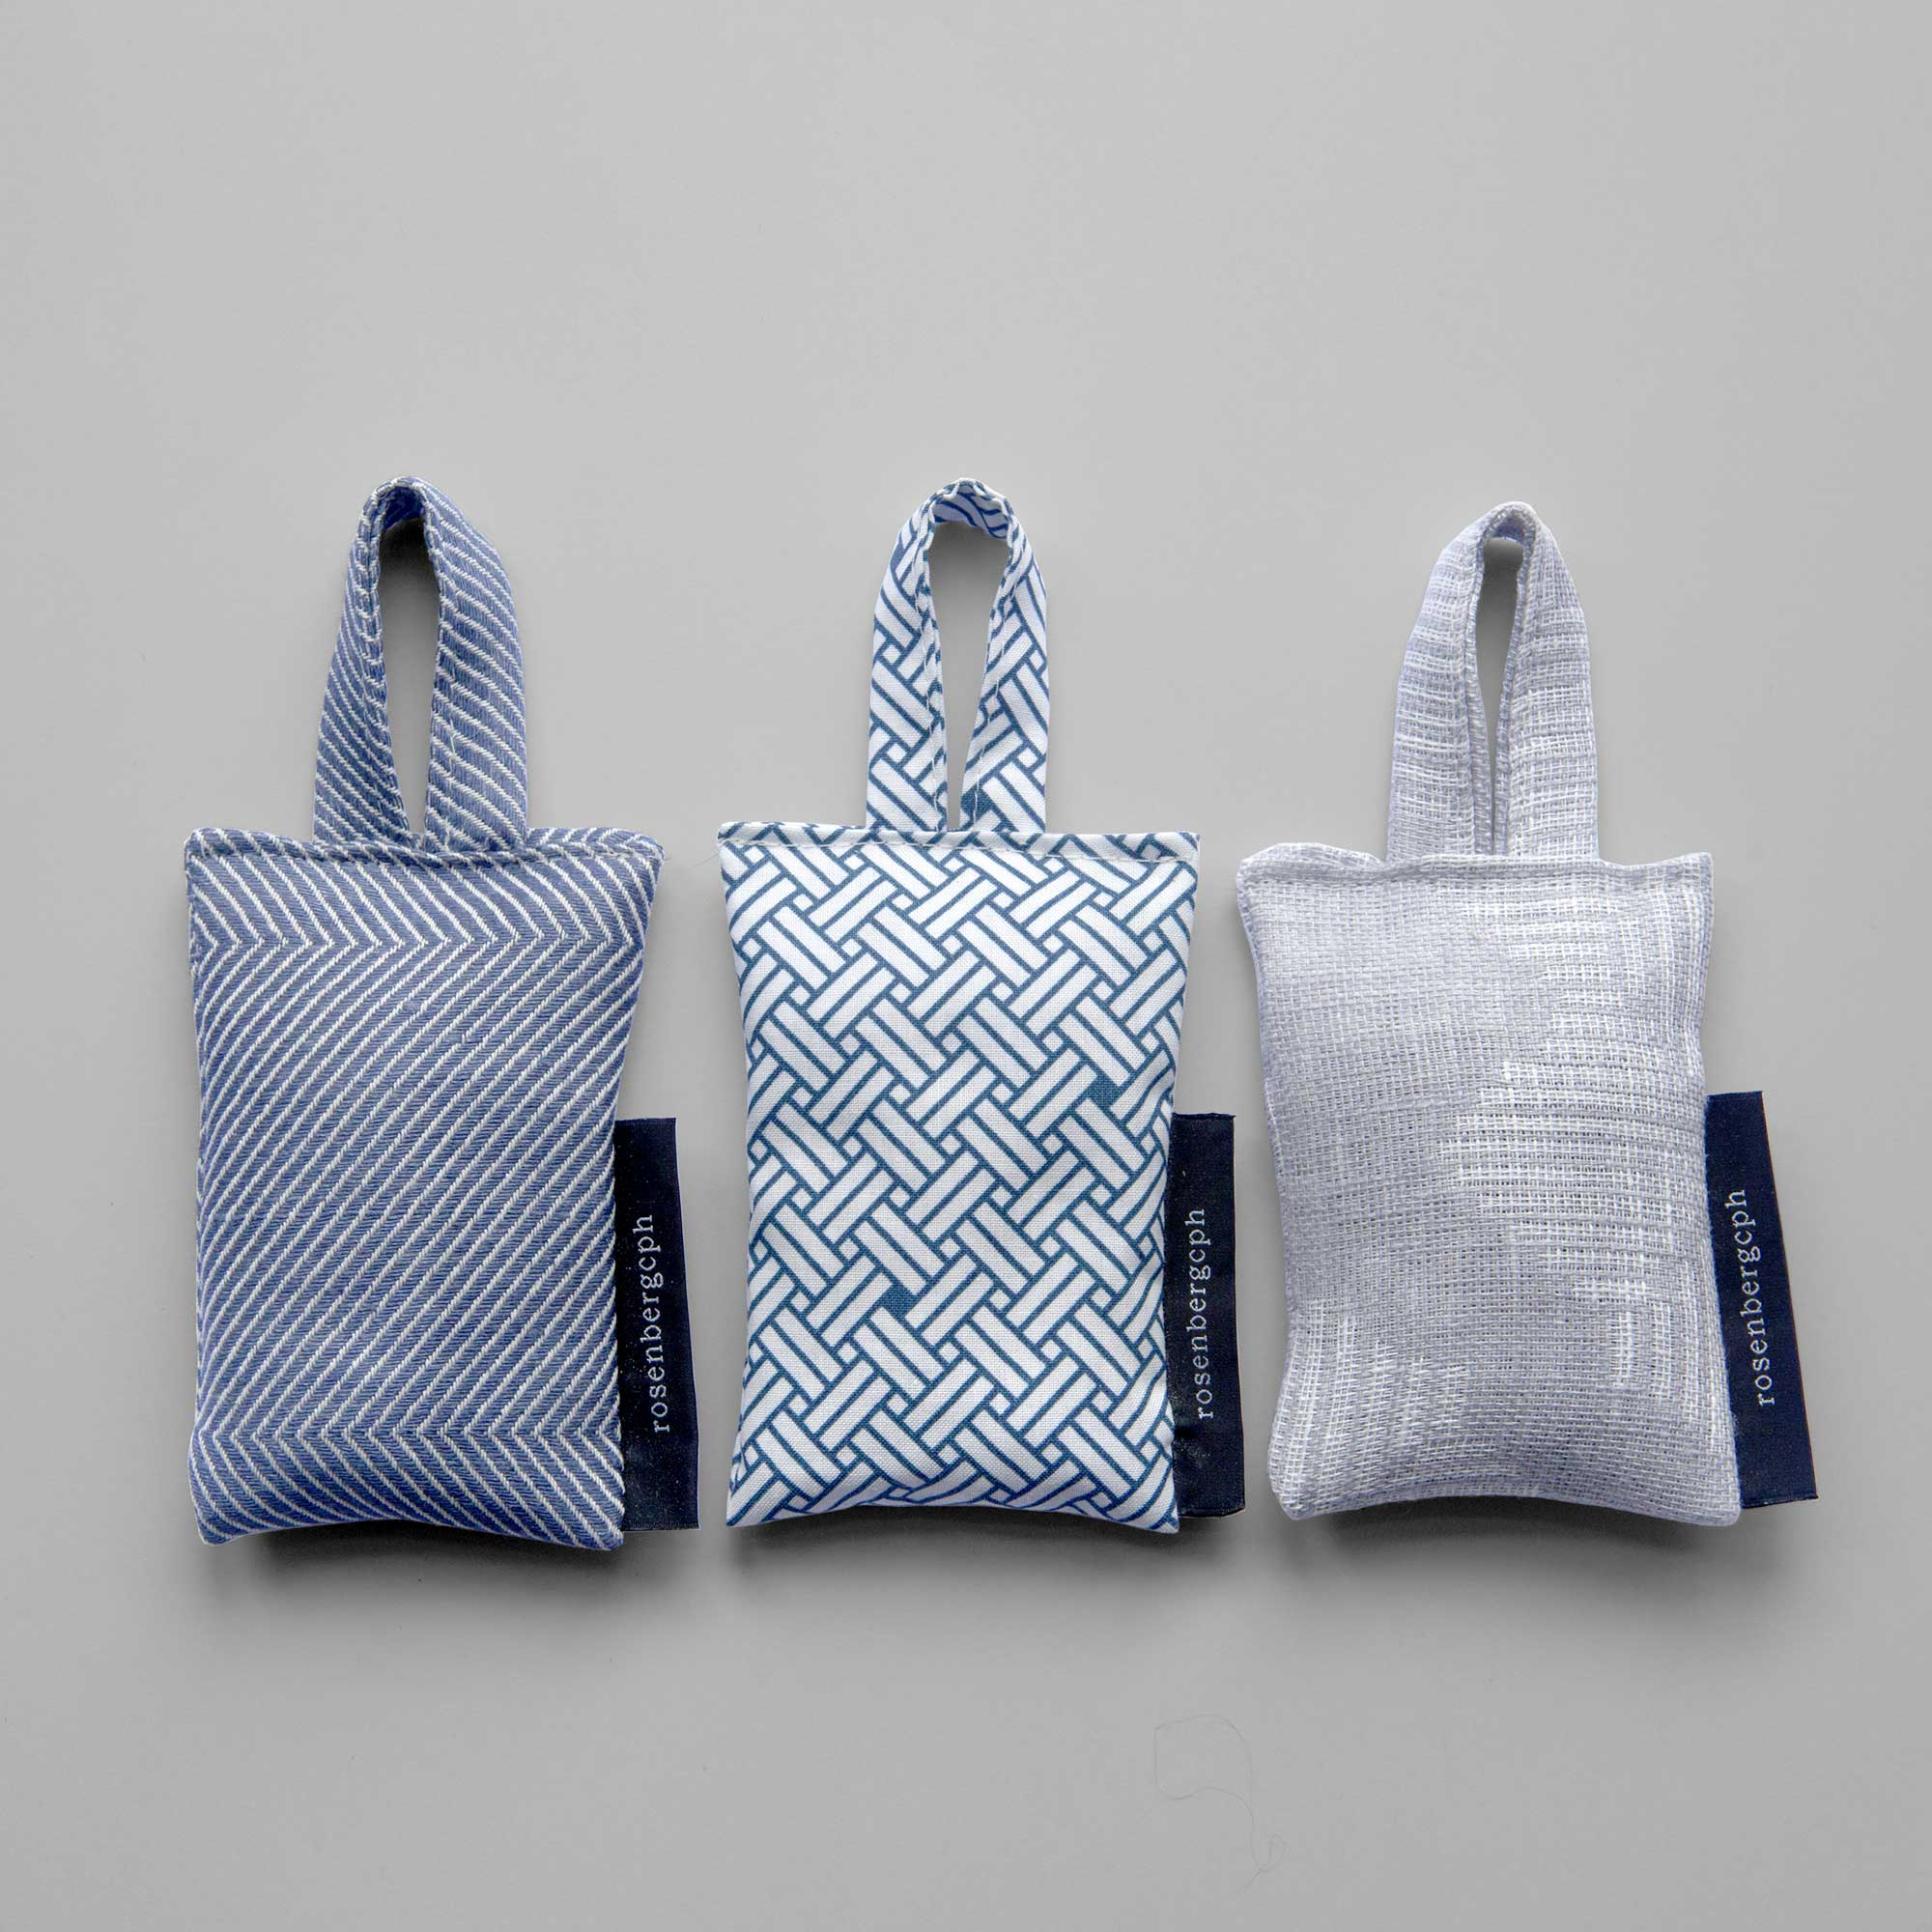 Lavender bags, blue. Organically grown flowers